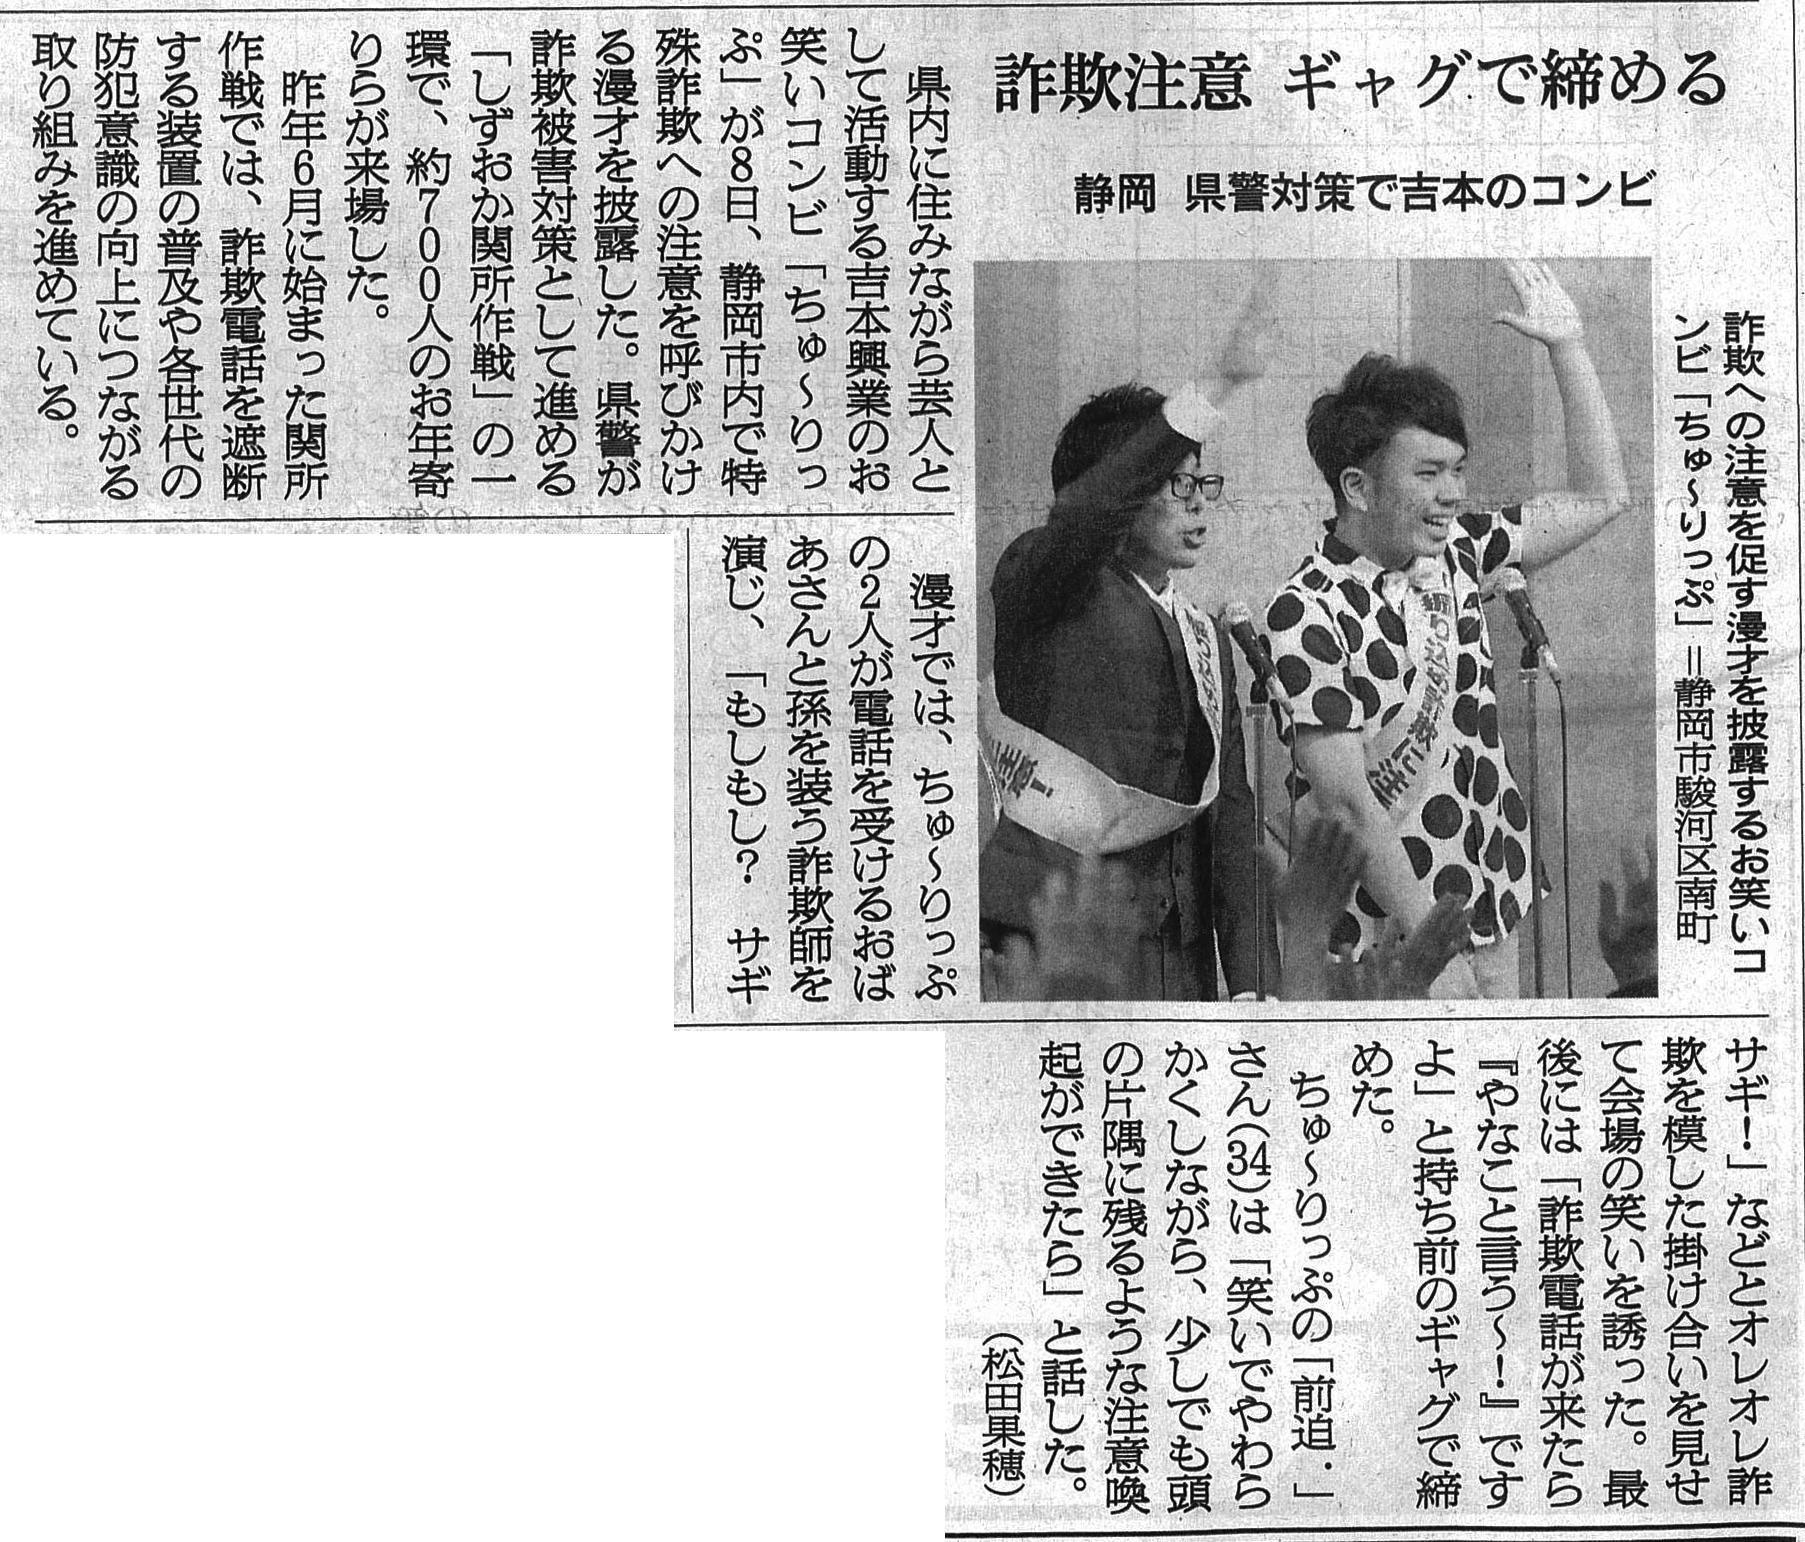 http://47web.jp/shizuoka/uploads/b356550e5ad1f6c13b1989e6c29faace61b9c507.jpg